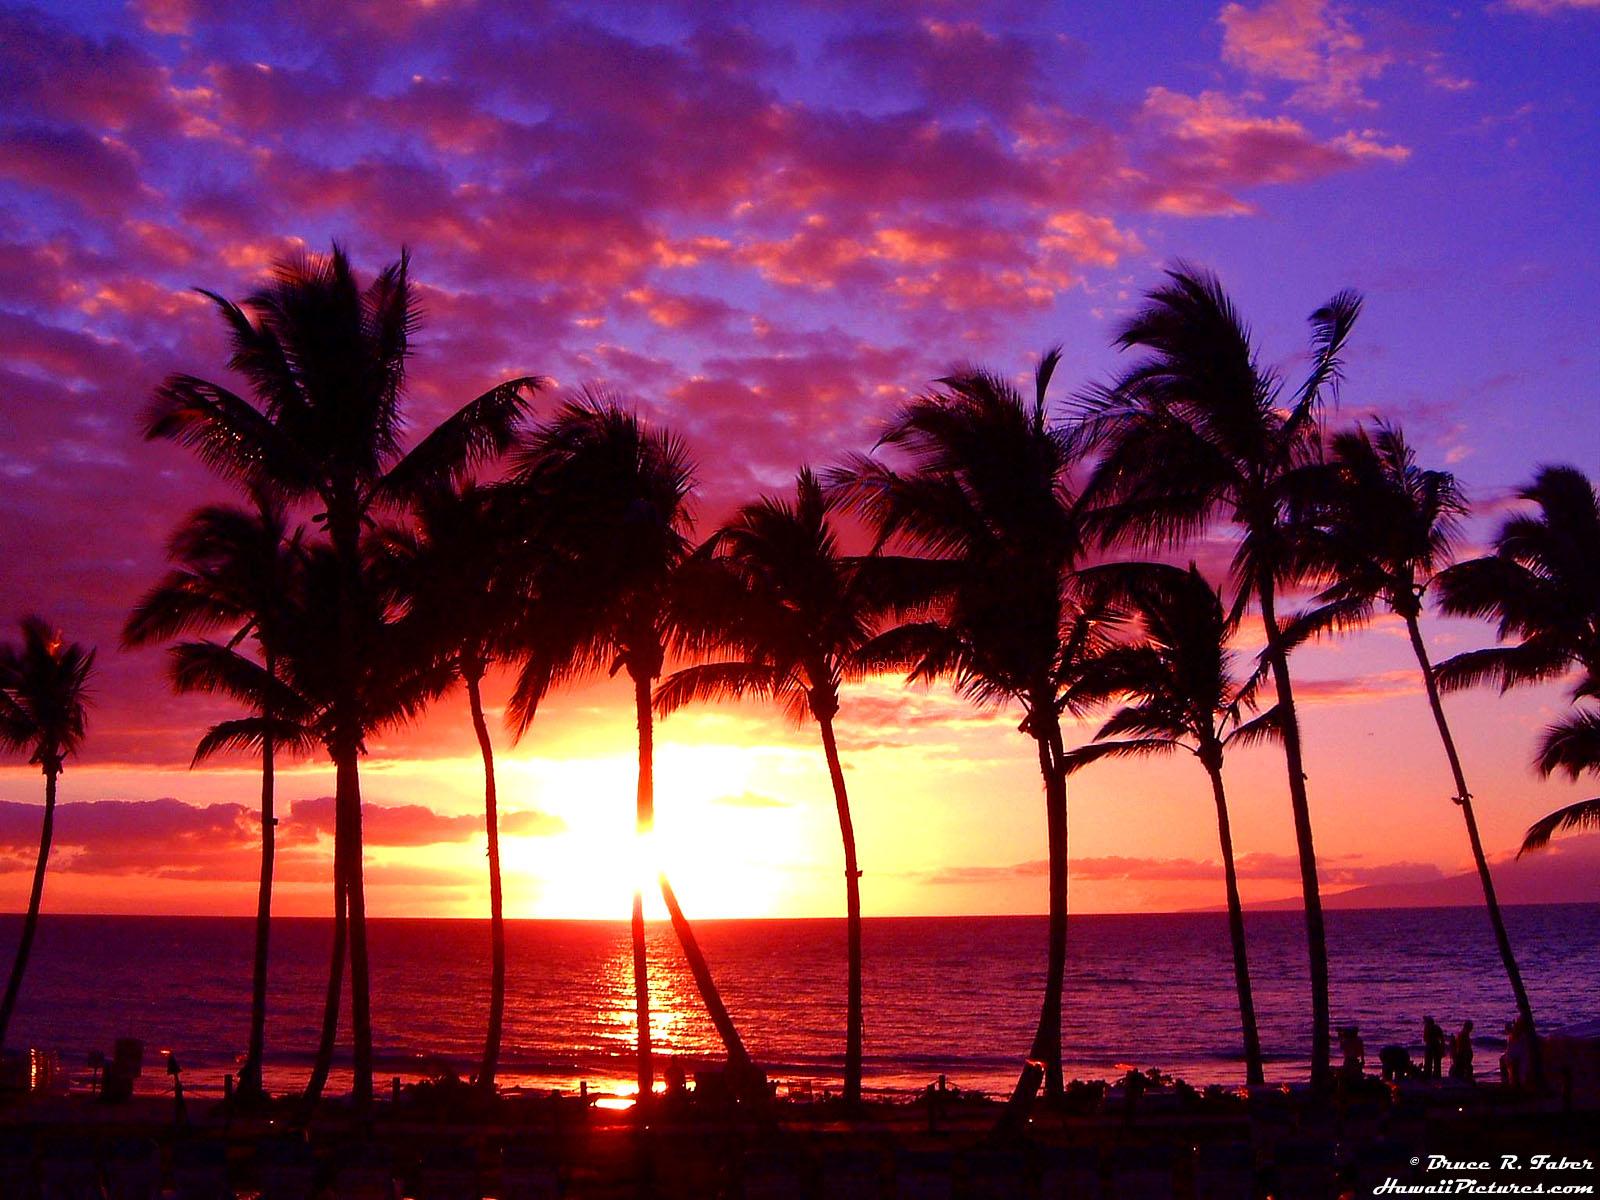 Sunset at Maui Hawaii Wallpaper Wallpupcom 1600x1200